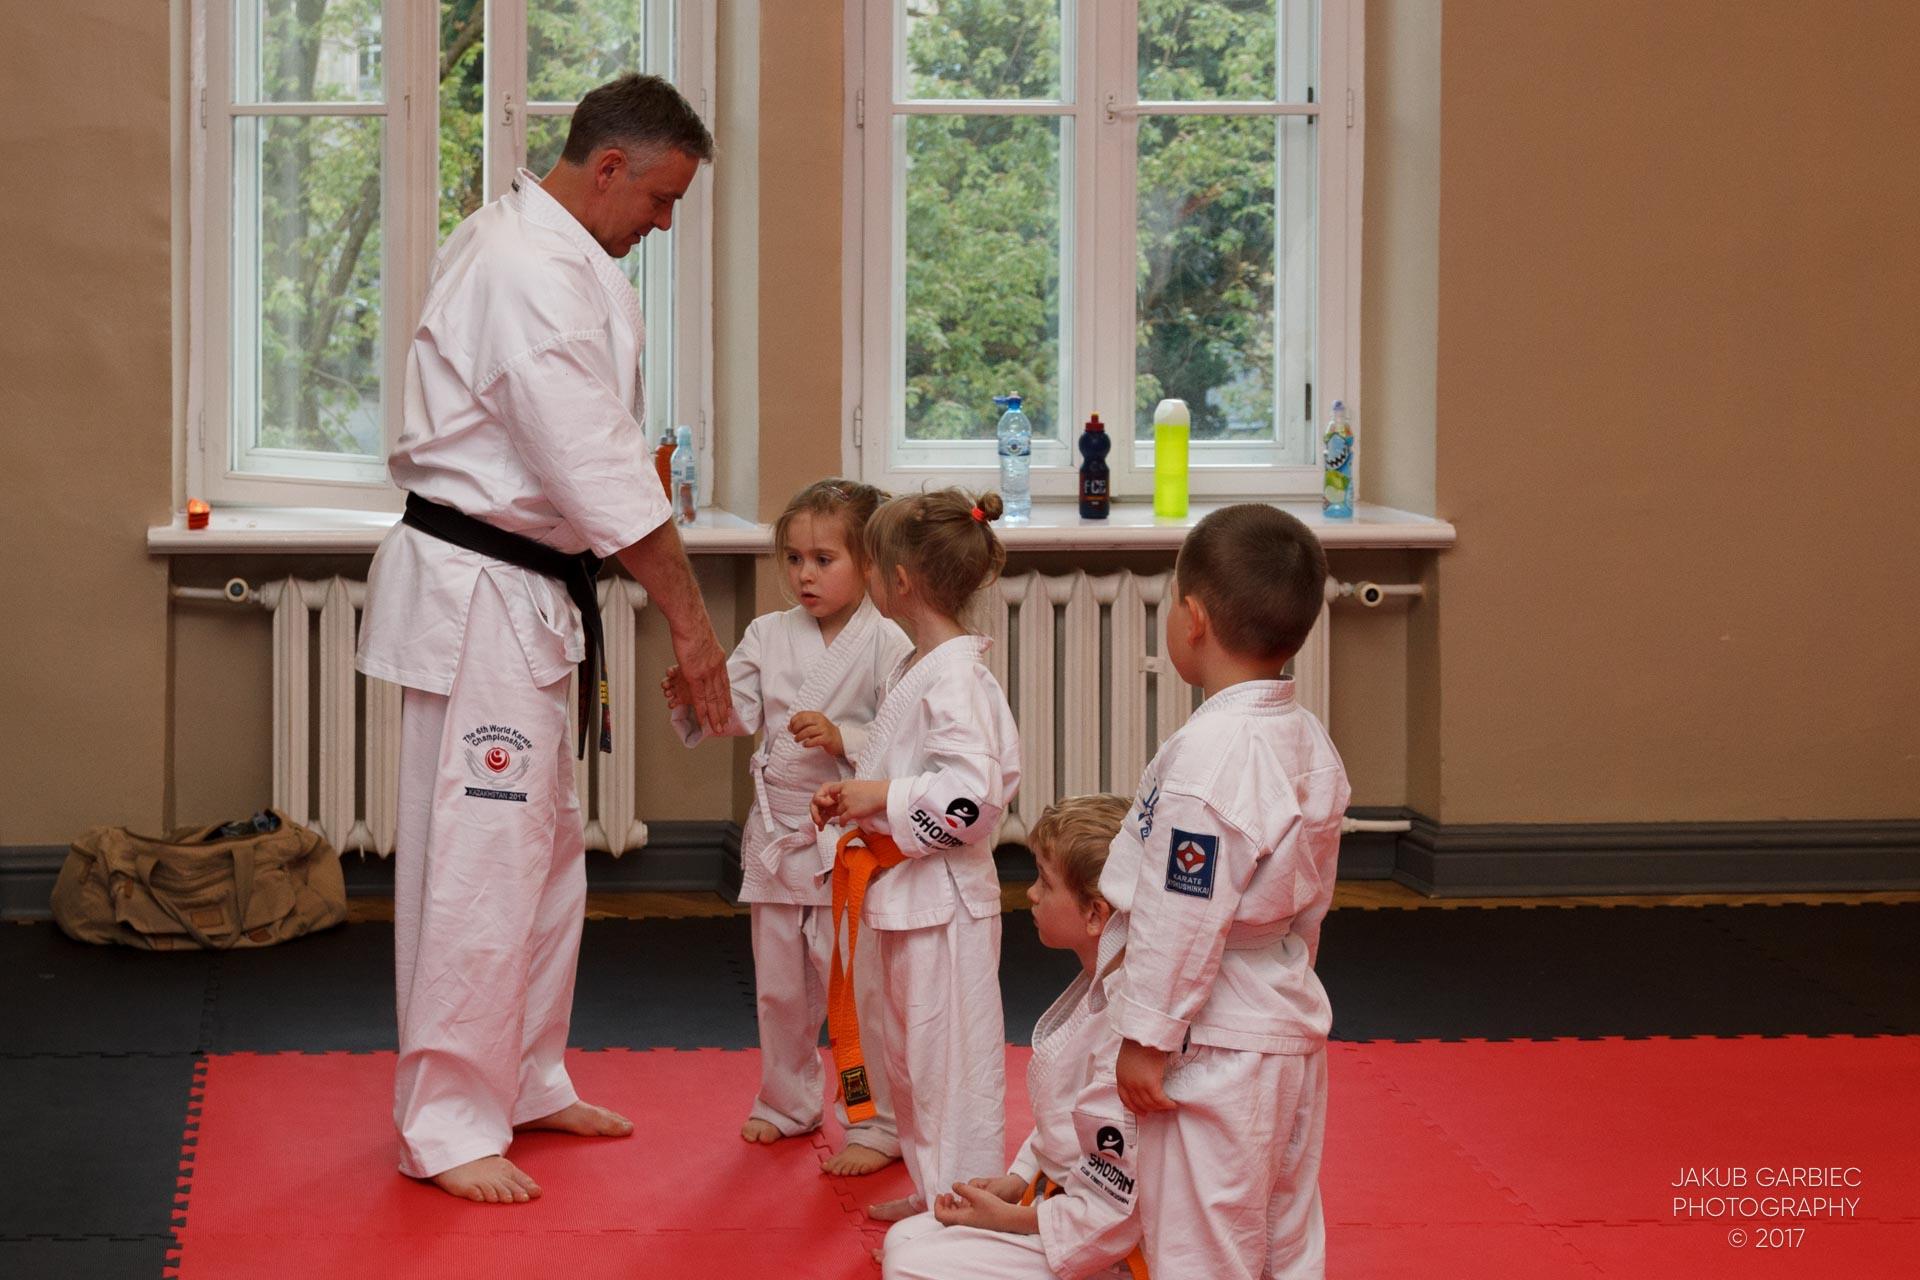 egzamin-karate-mistrz-mariusz-mazur-klub-karate-shodan-2017-06-02-22